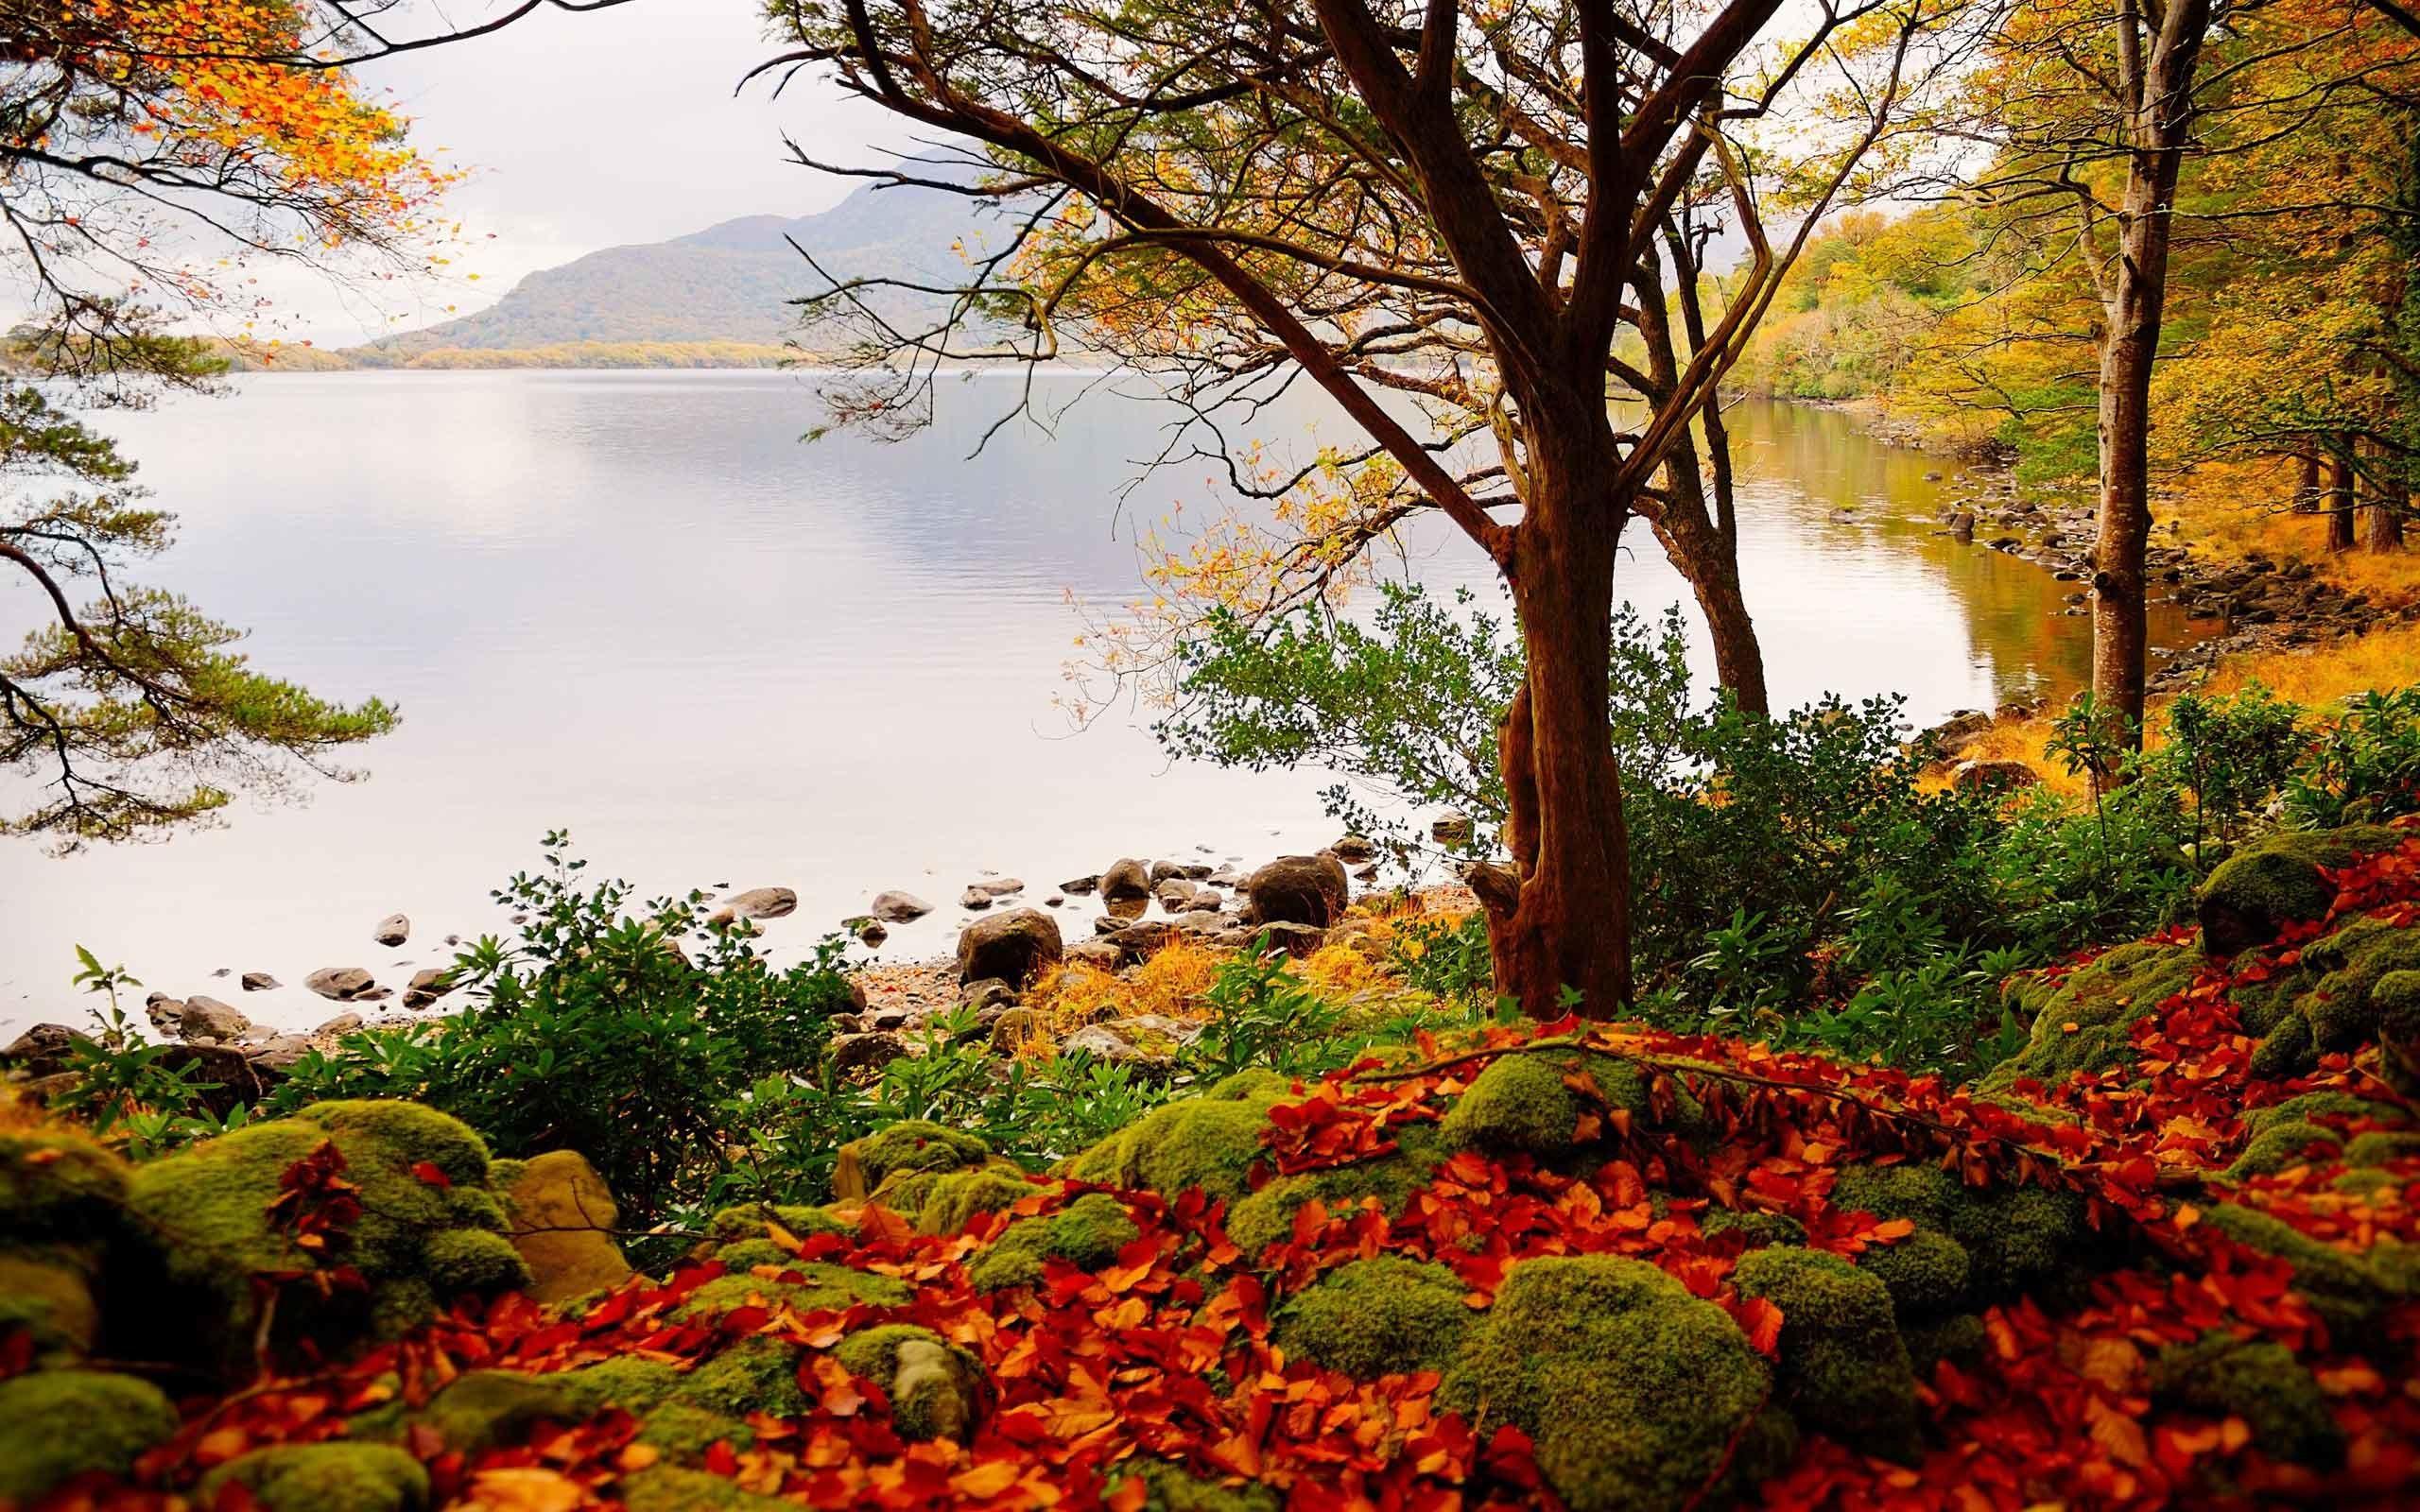 Birch Tree Fall Wallpaper Autumn Landscape Wallpaper 69 Images